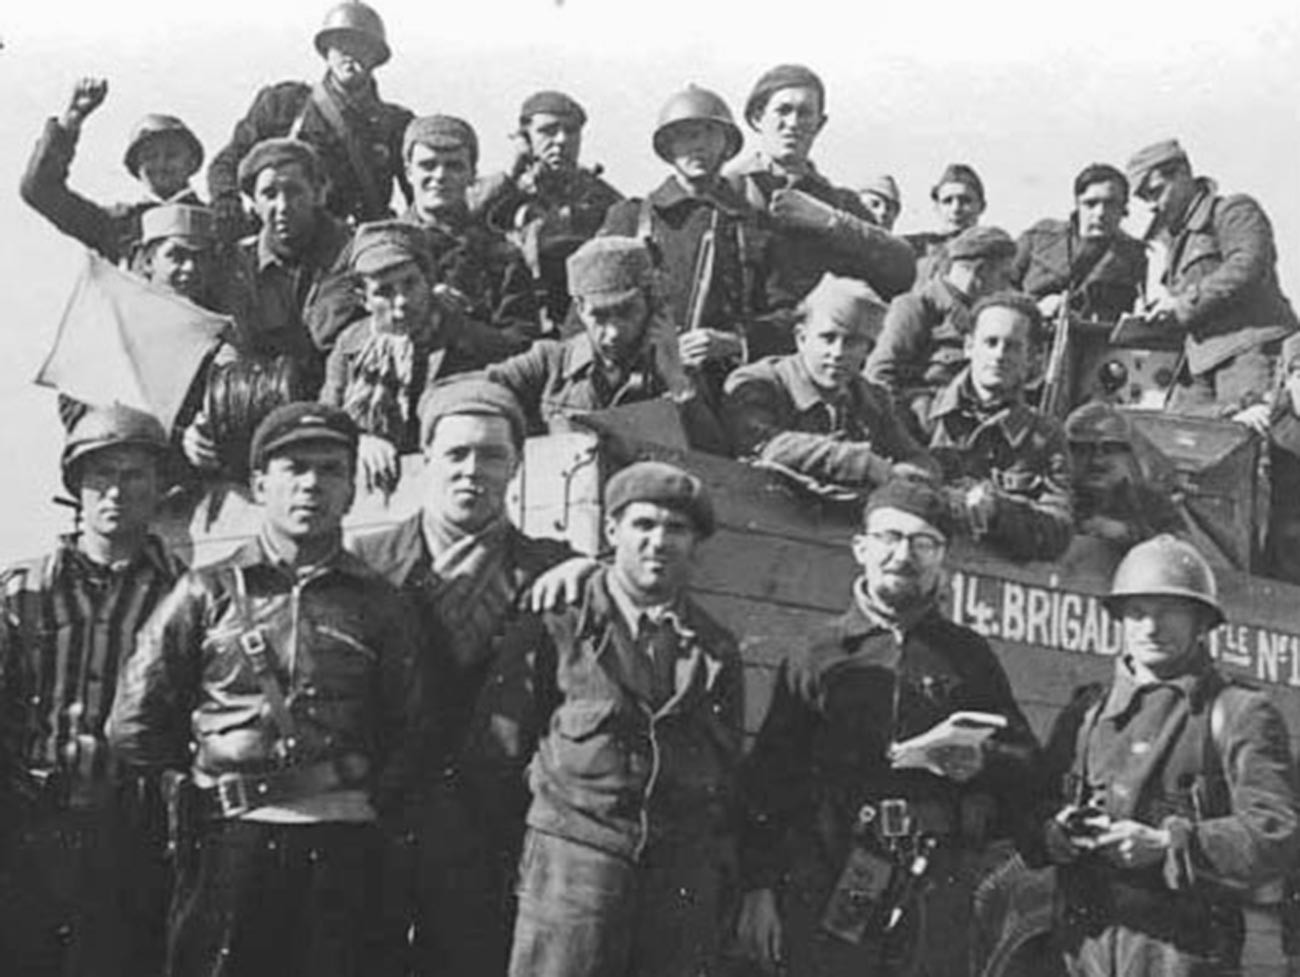 The 14th International Brigade.